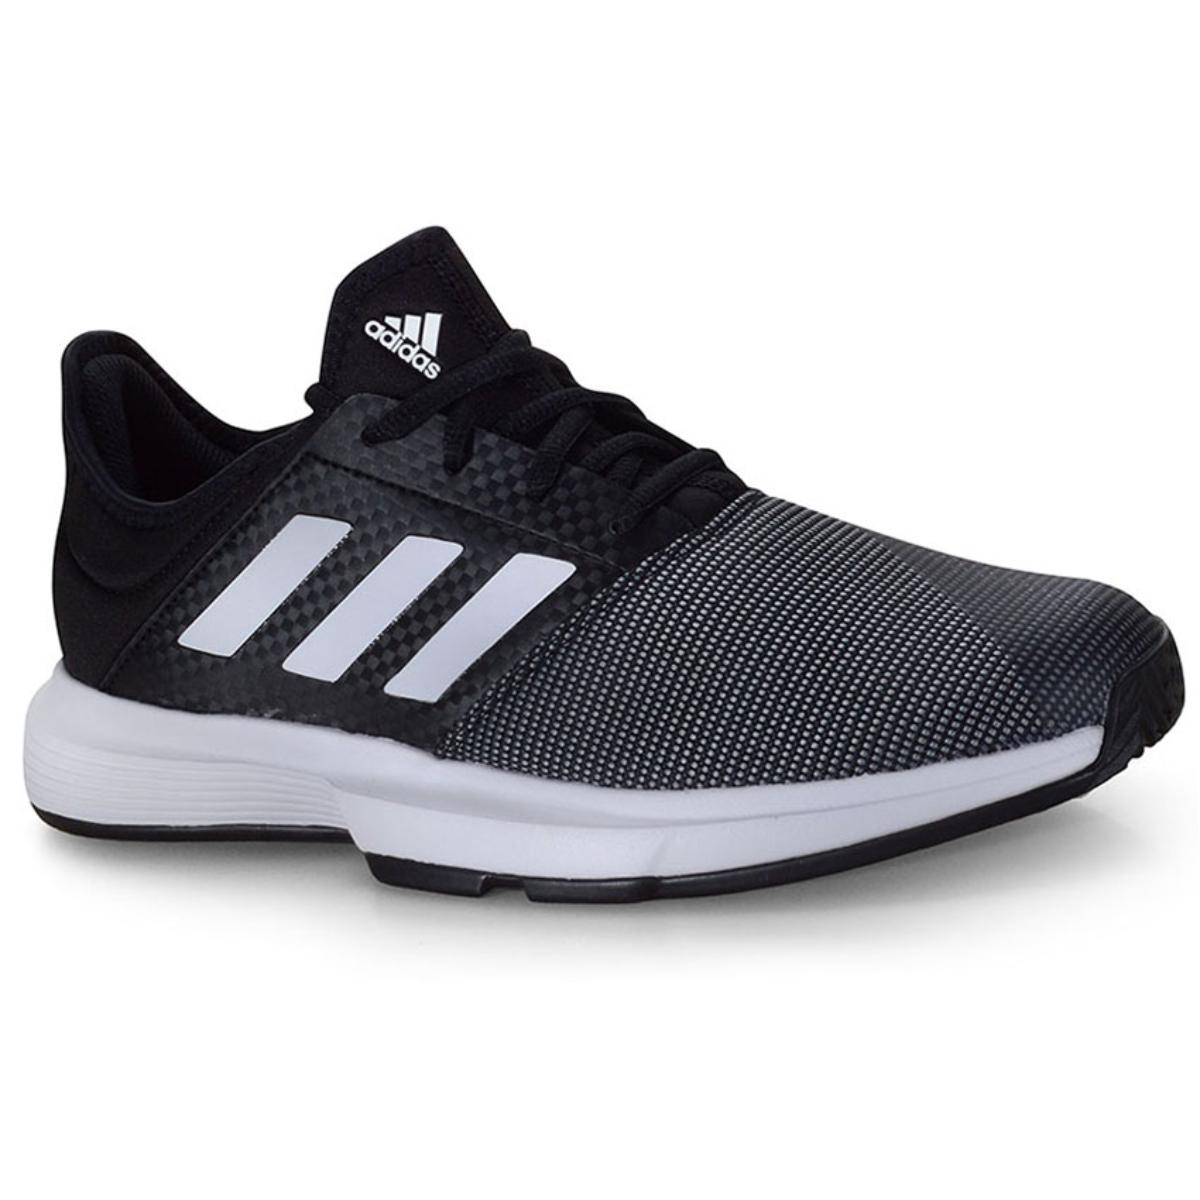 Tênis Masculino Adidas Eg2009 Gamecourt m Preto/branco/cinza